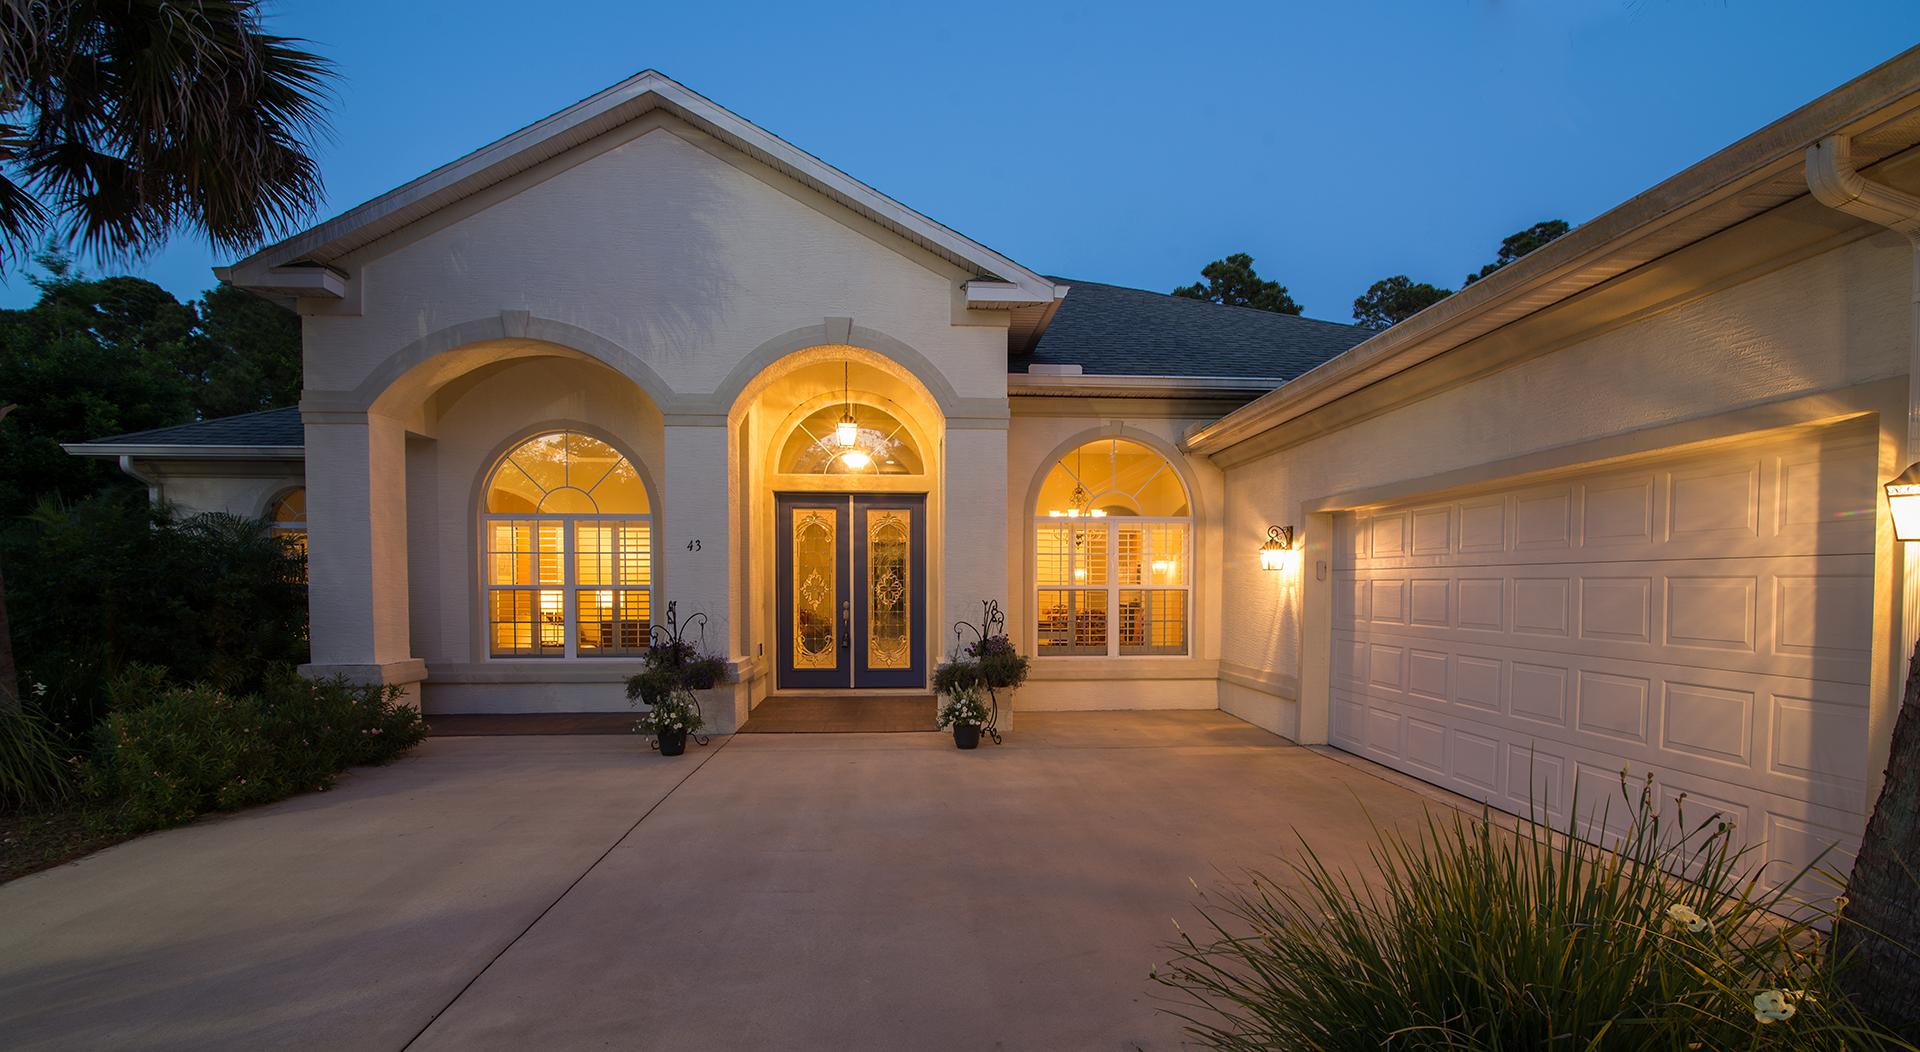 Staged-Assets-Home-Staging-Interior-Design-Palm-Coast-Florida-20